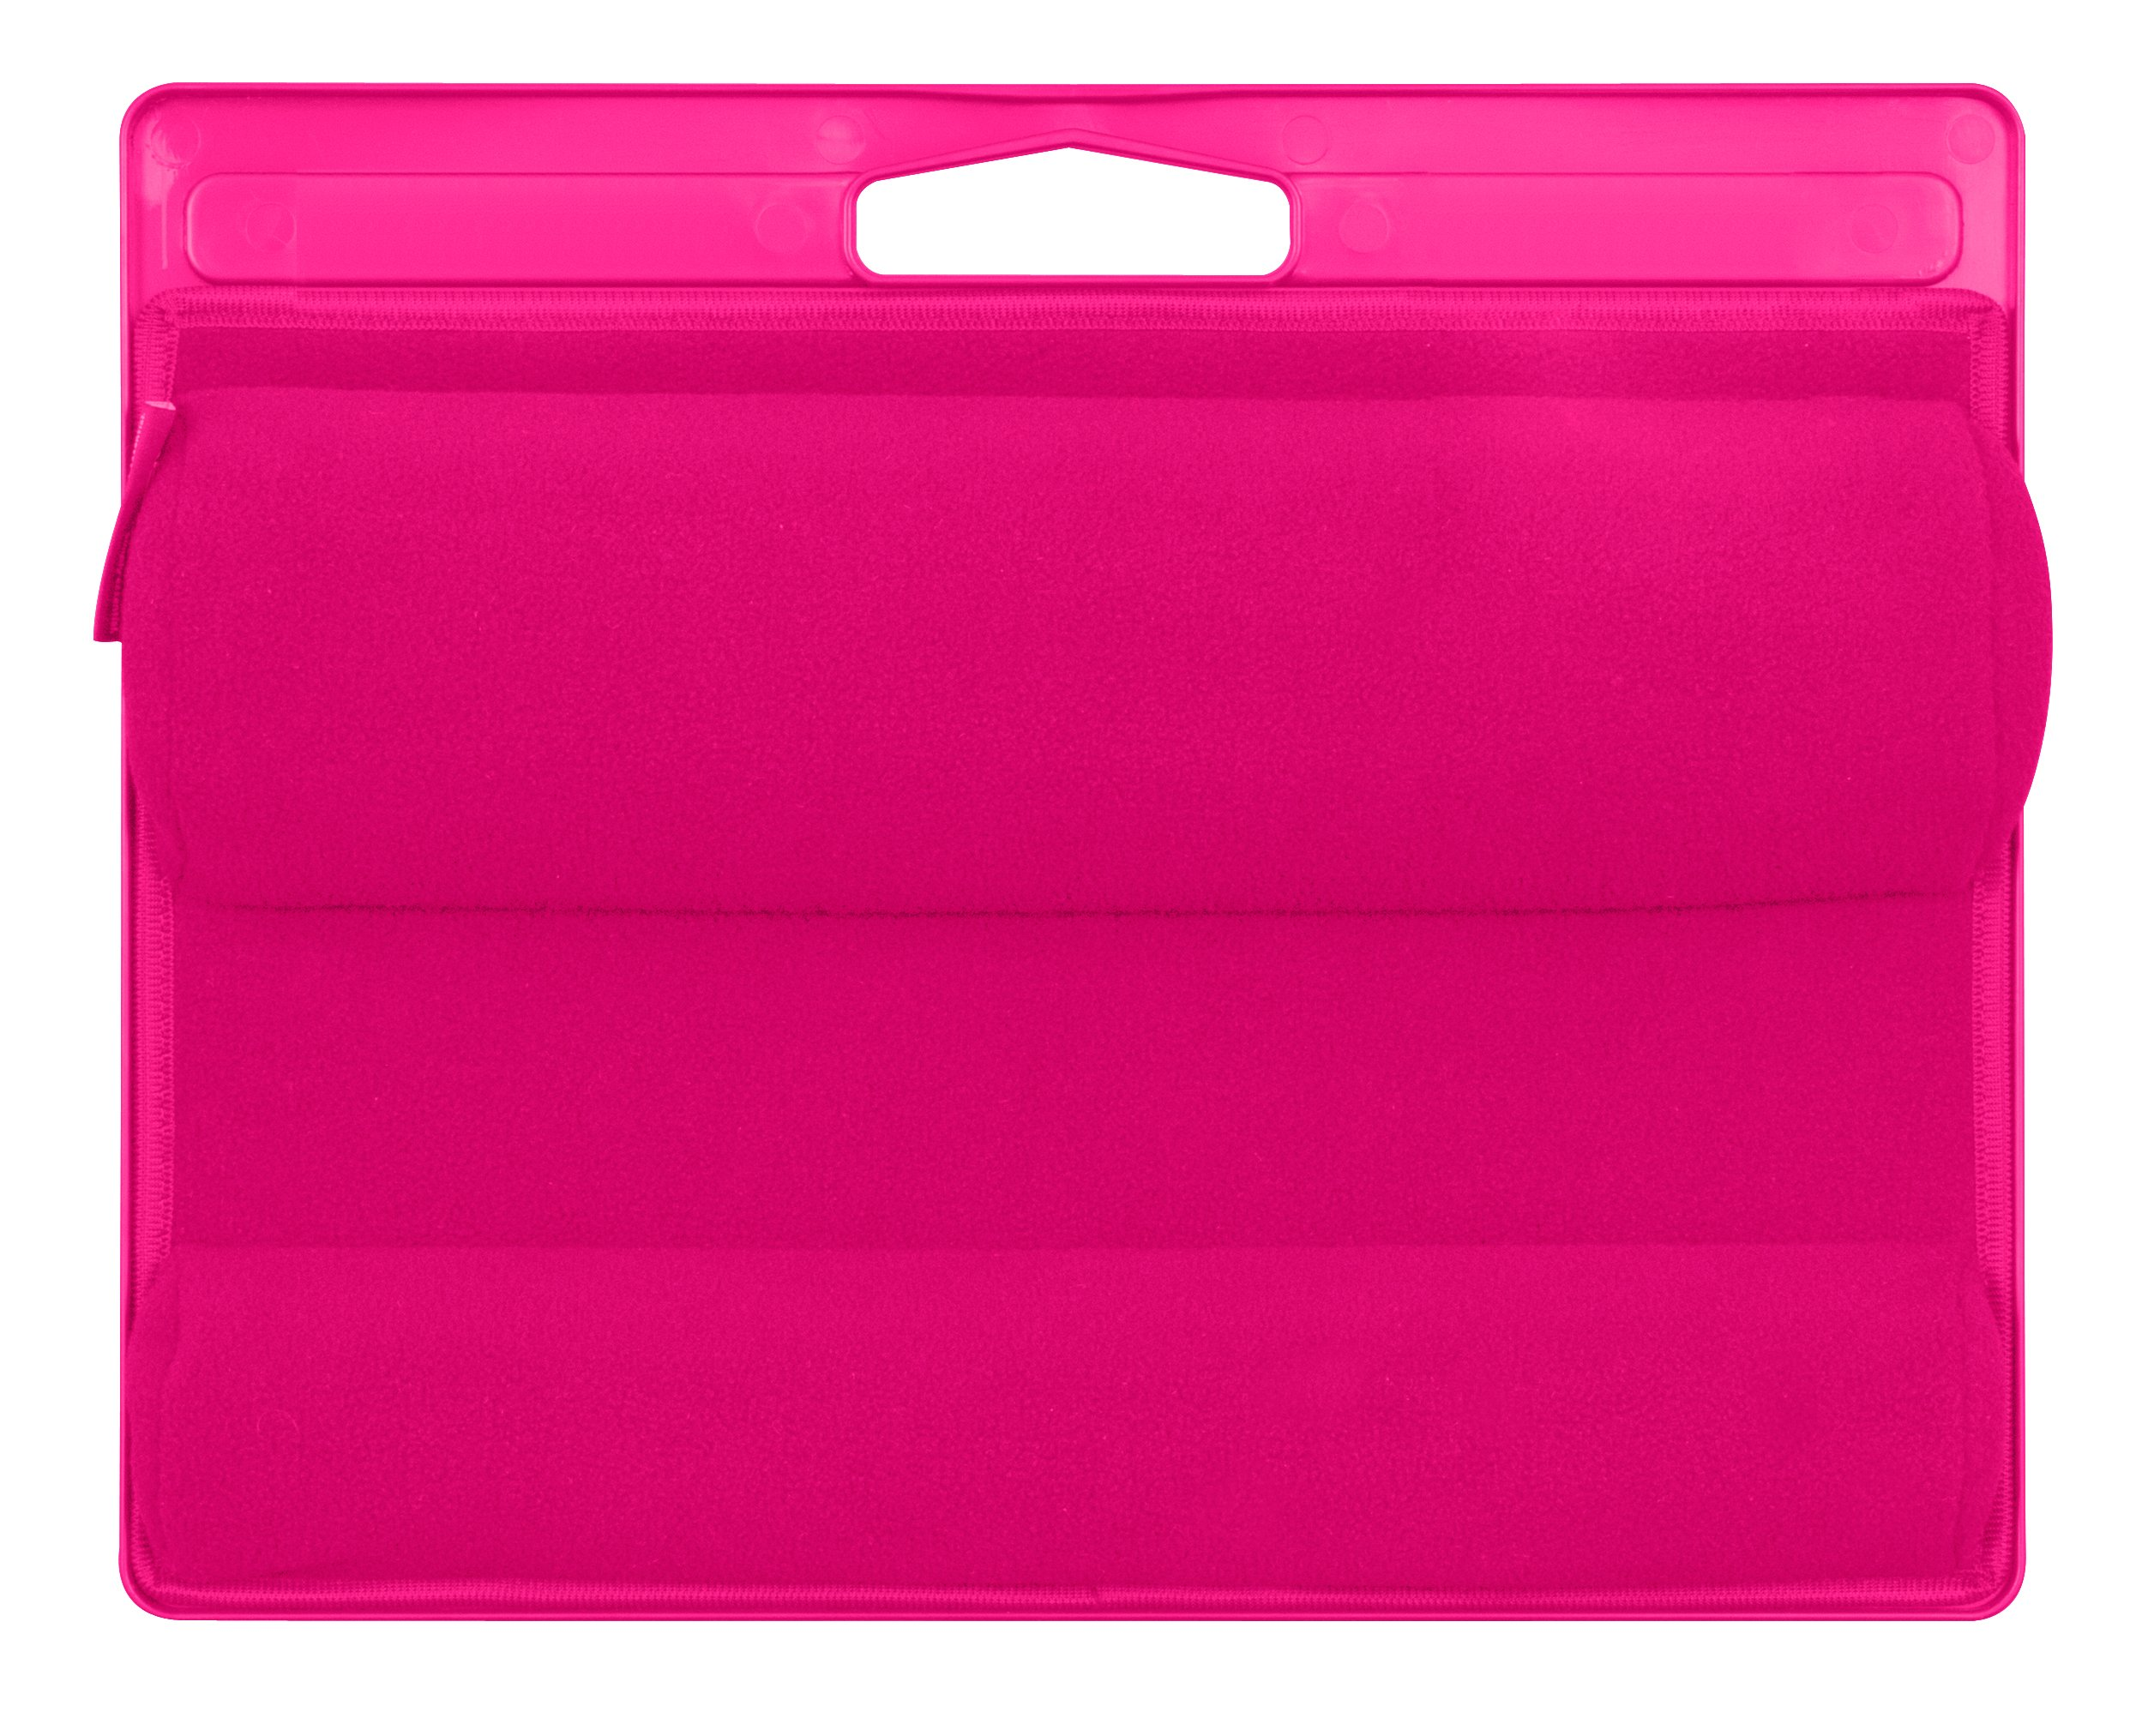 LapGear Student LapDesk 45017 Pink by Lap Desk (Image #2)